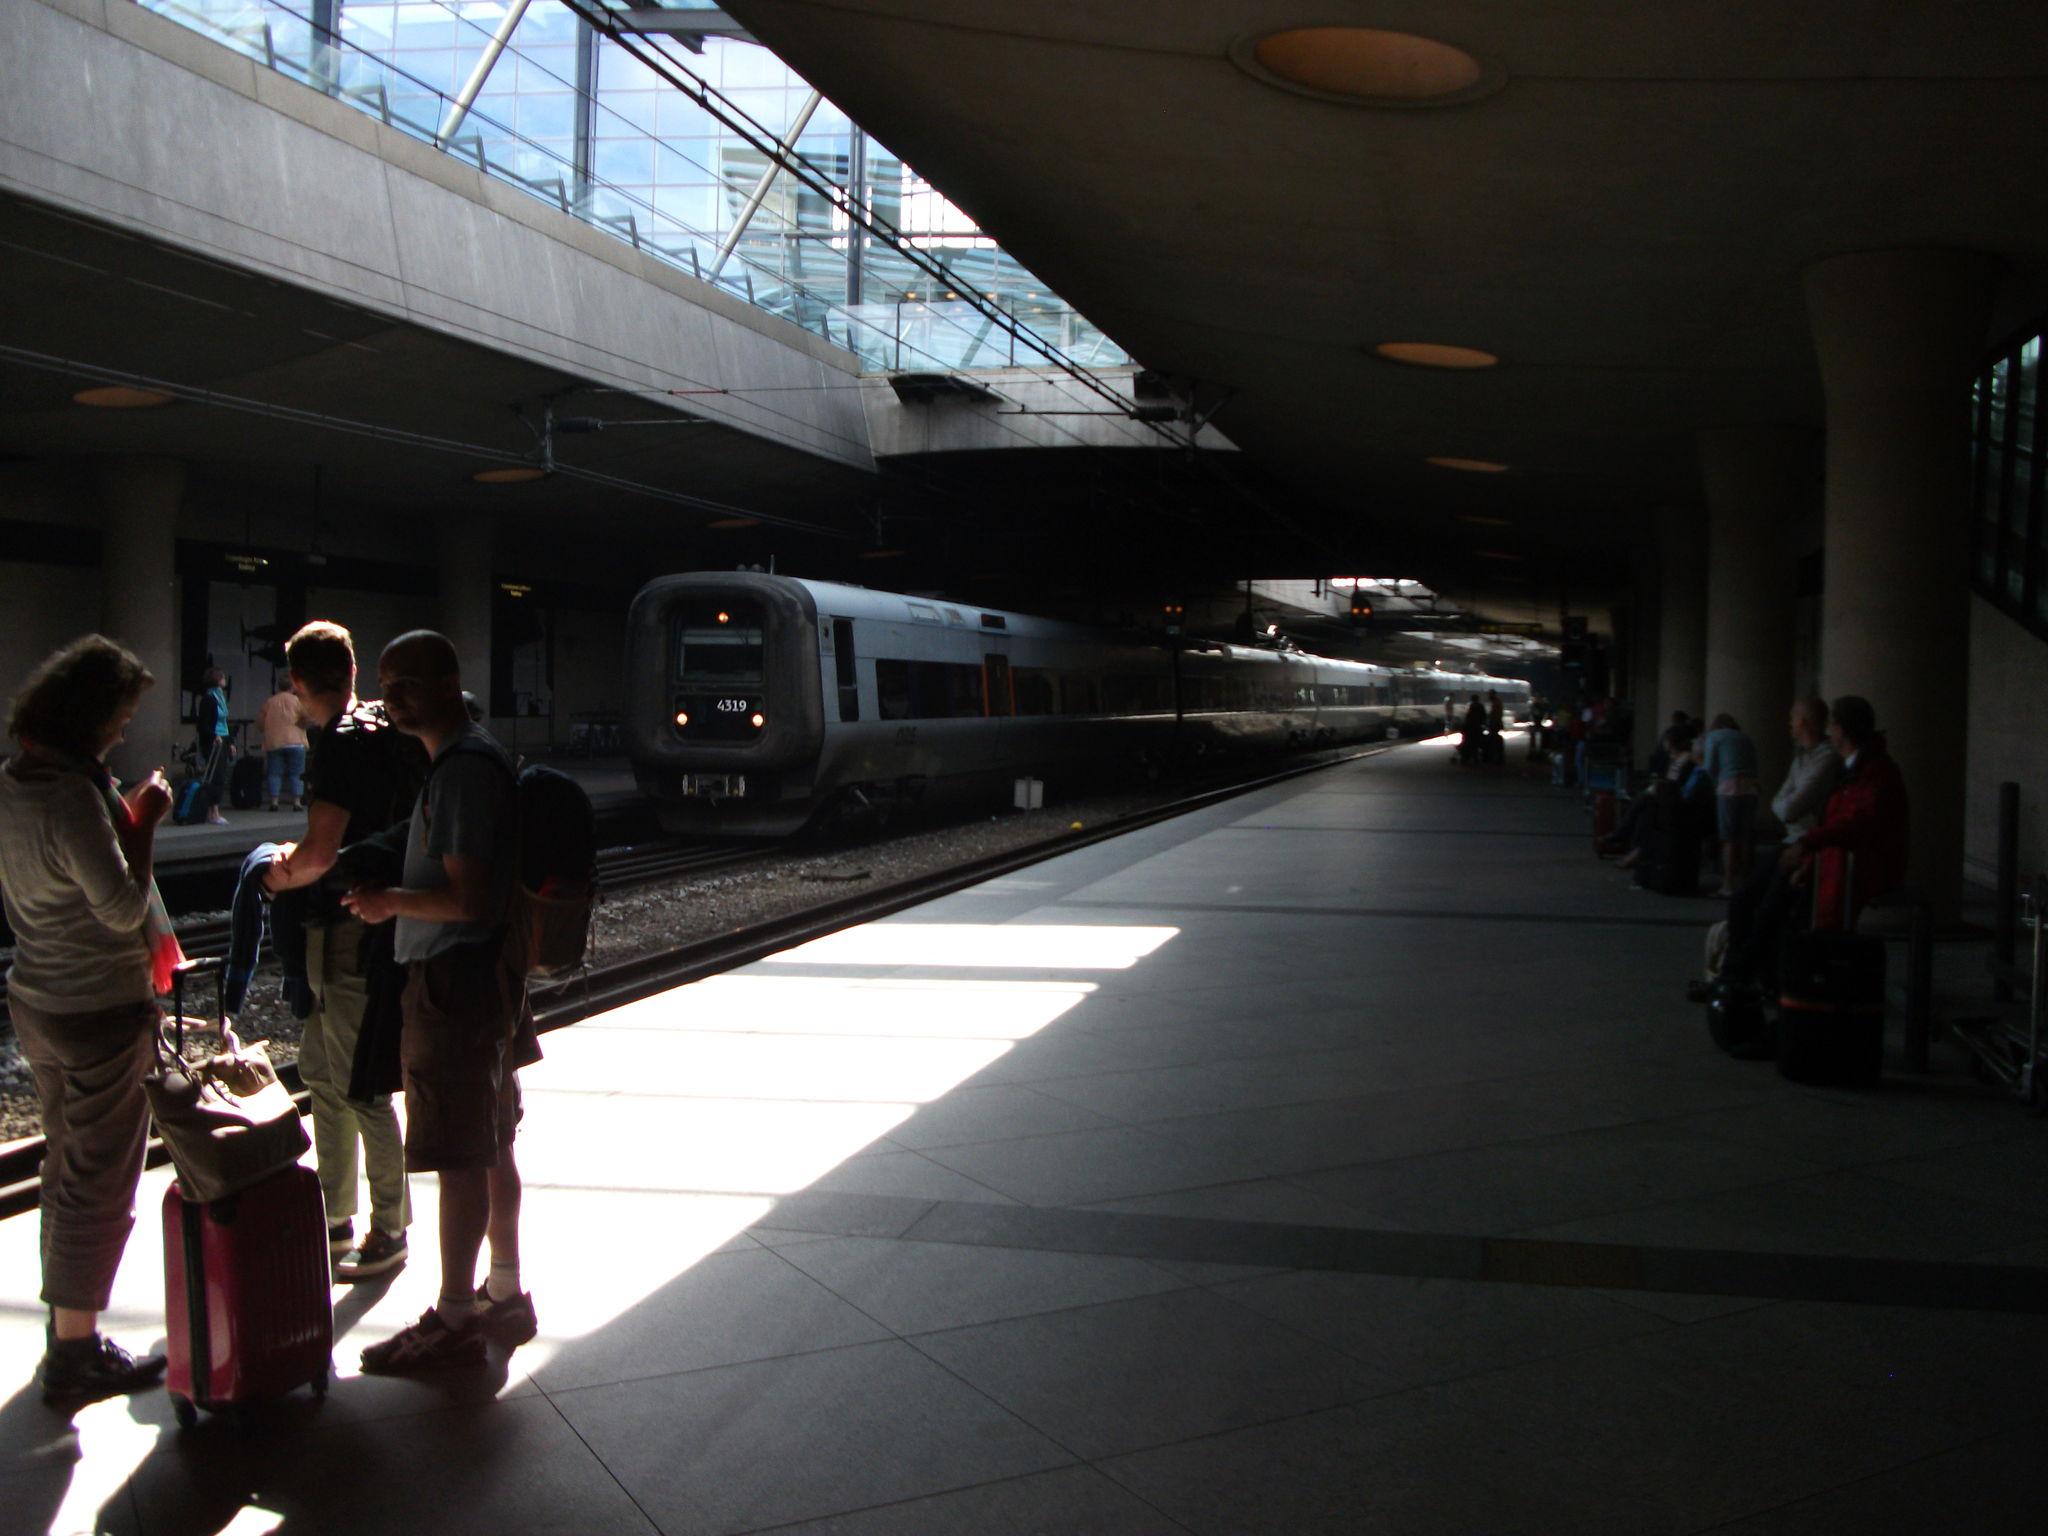 Copenhague Lufthavn (Danemark)